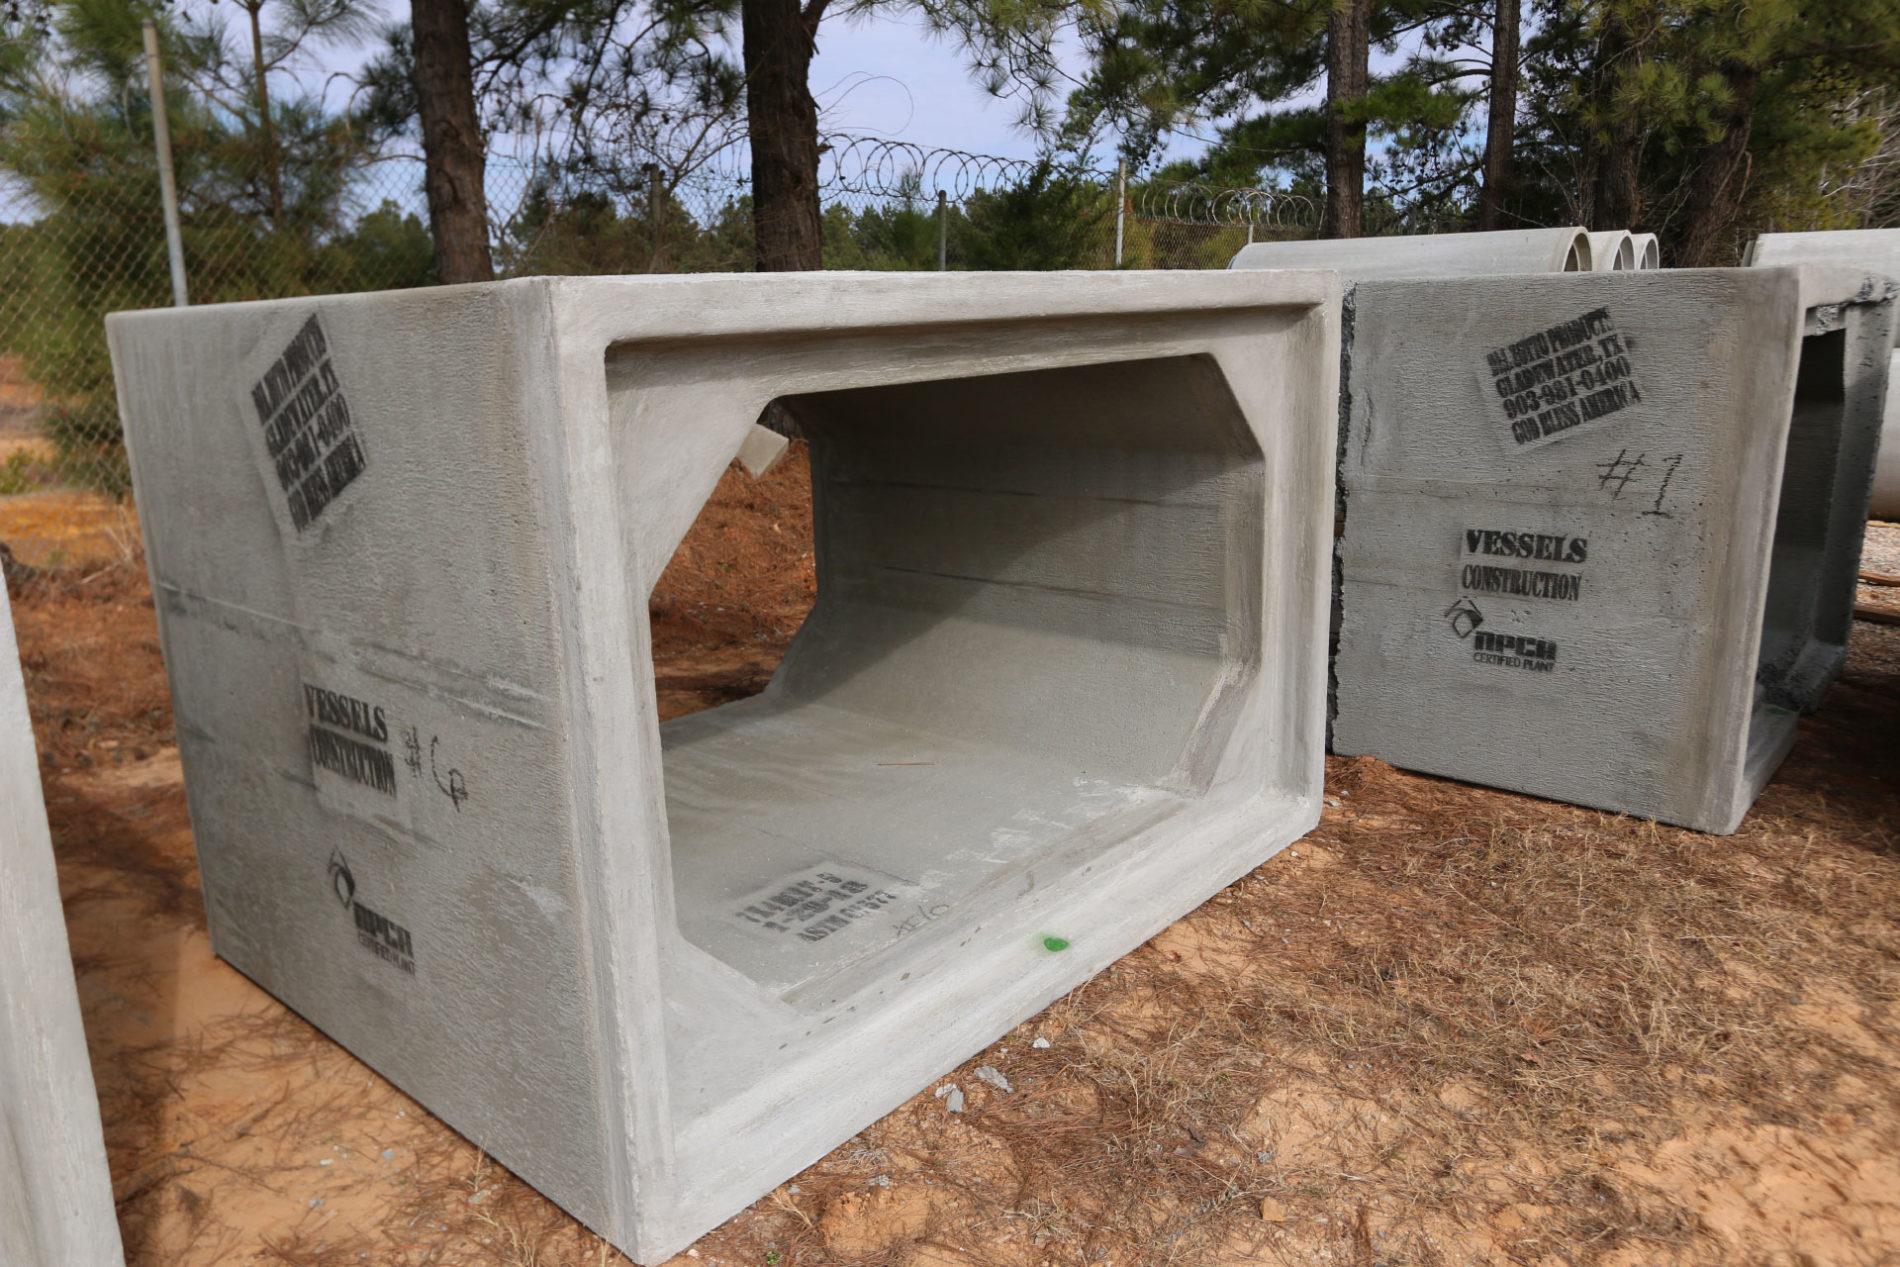 Angle View of Box Culvert